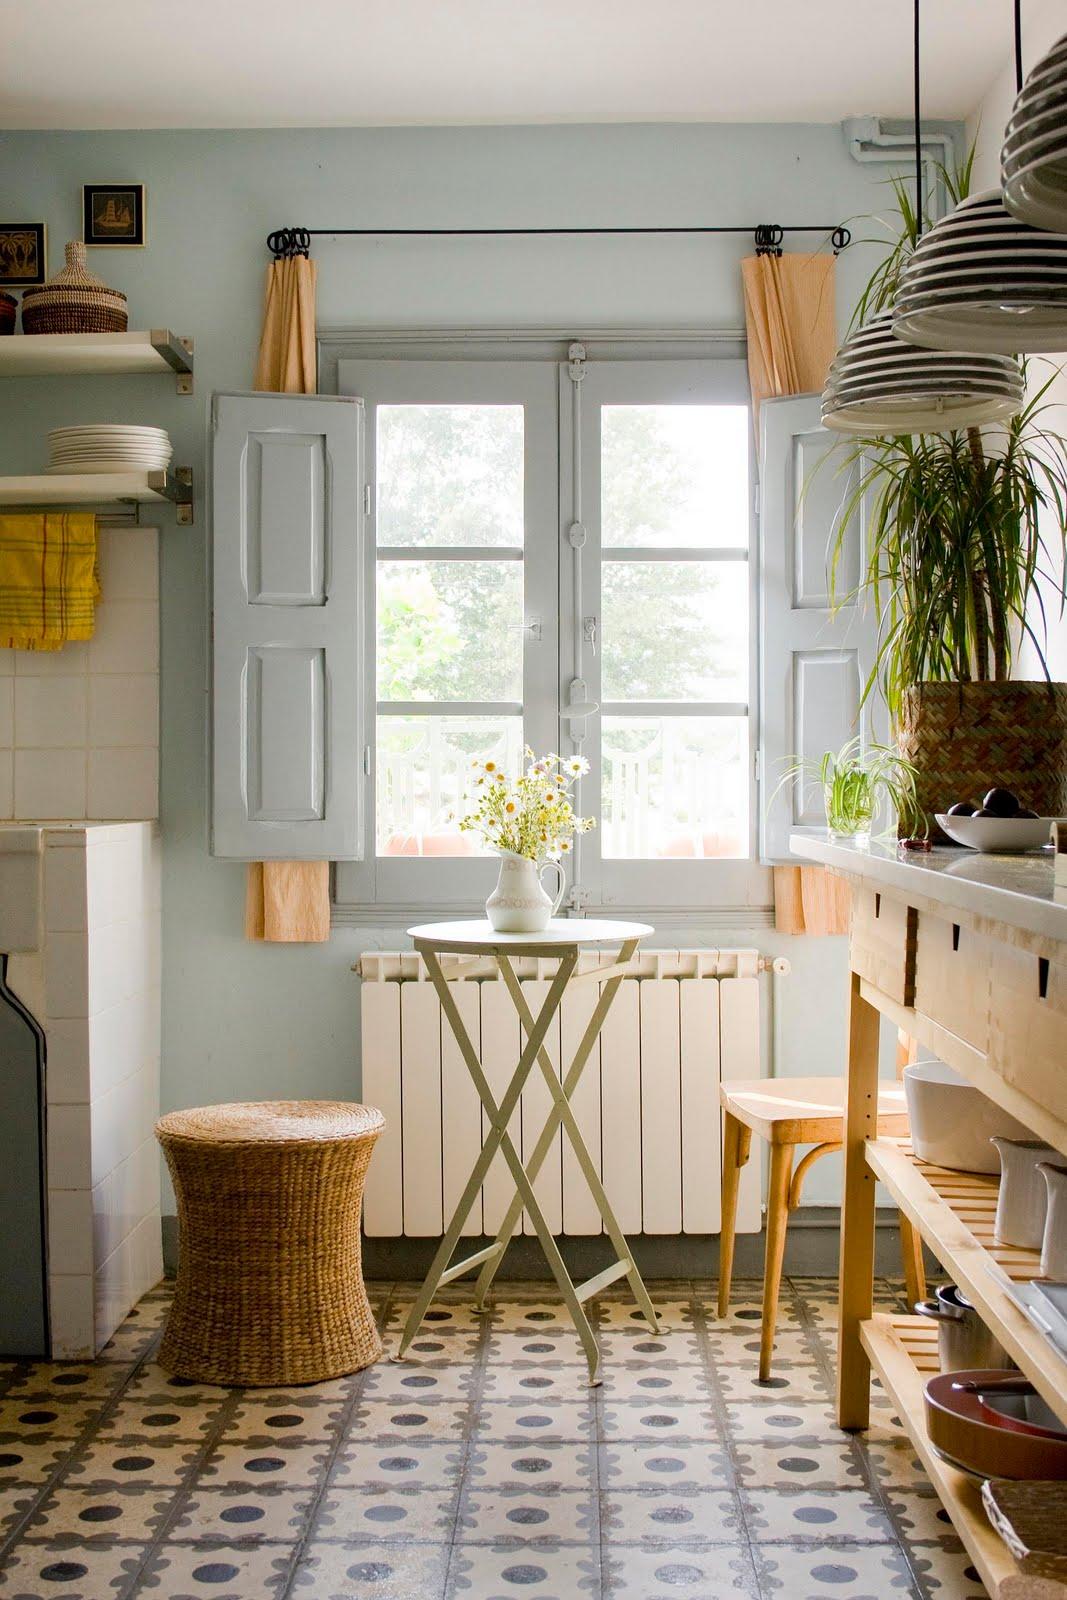 Marta decoycina baldosas hidraulicas aire antiguo para for Baldosas cocina